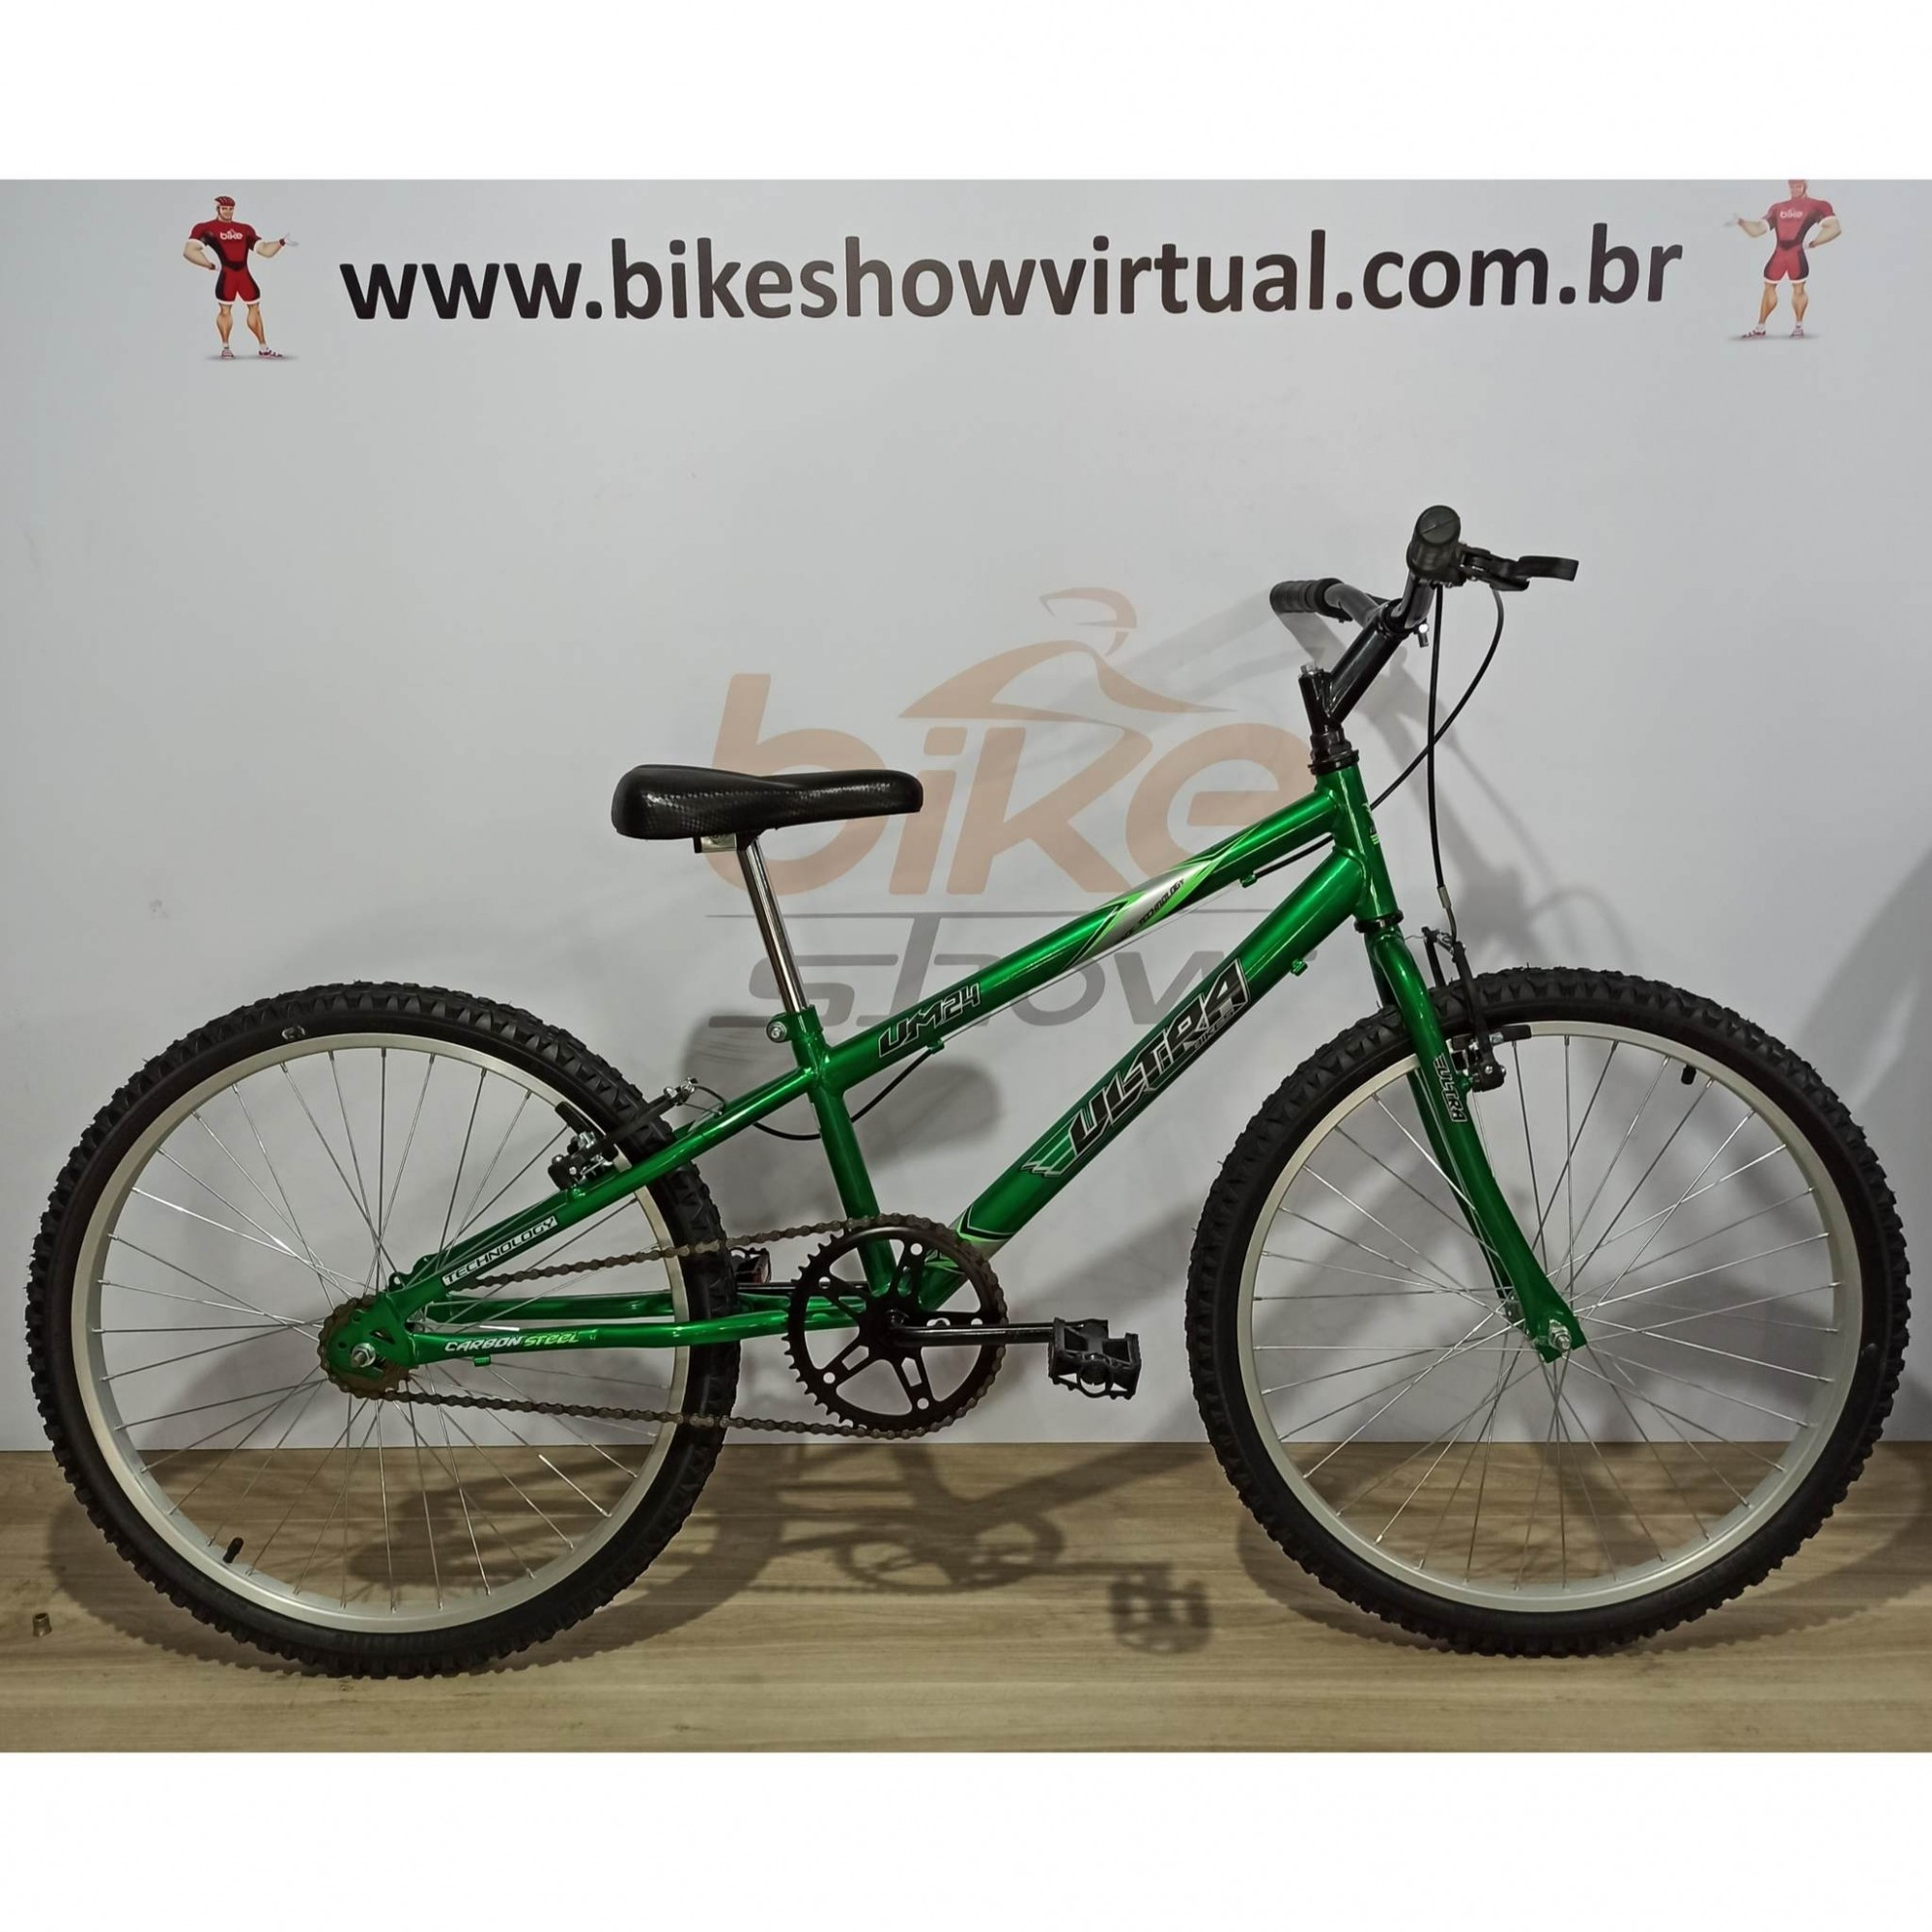 Bicicleta ULTRA BIKES aro 24 - Quadro Rebaixado - Sem Marcha